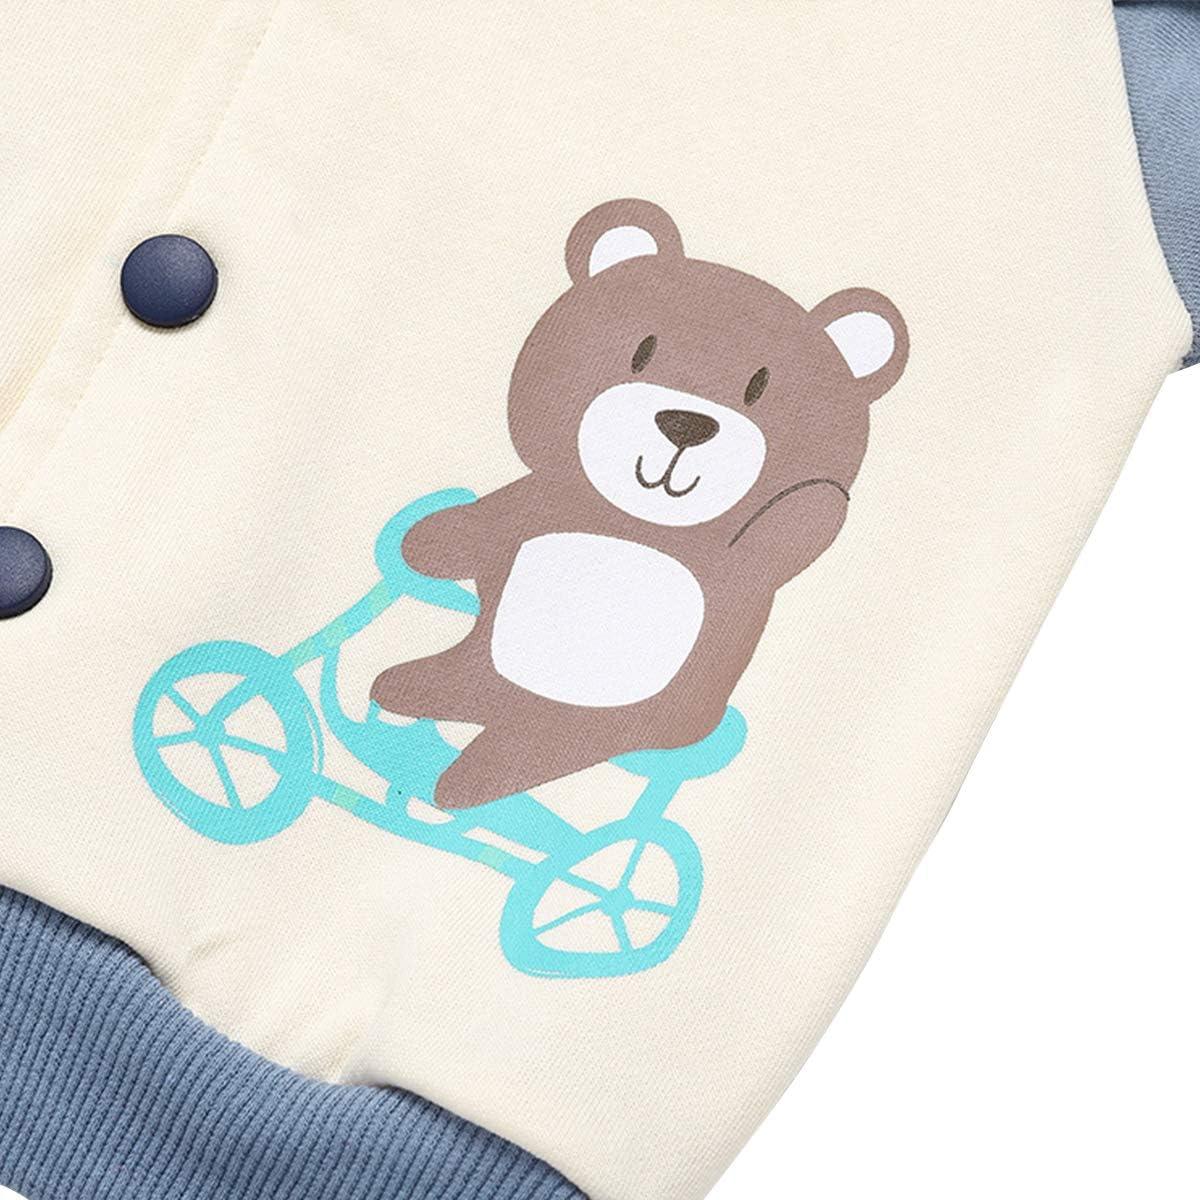 famuka Baby Jackets Boys Girls Outwear Autumn Winter Baseball Suit Coat Clothes